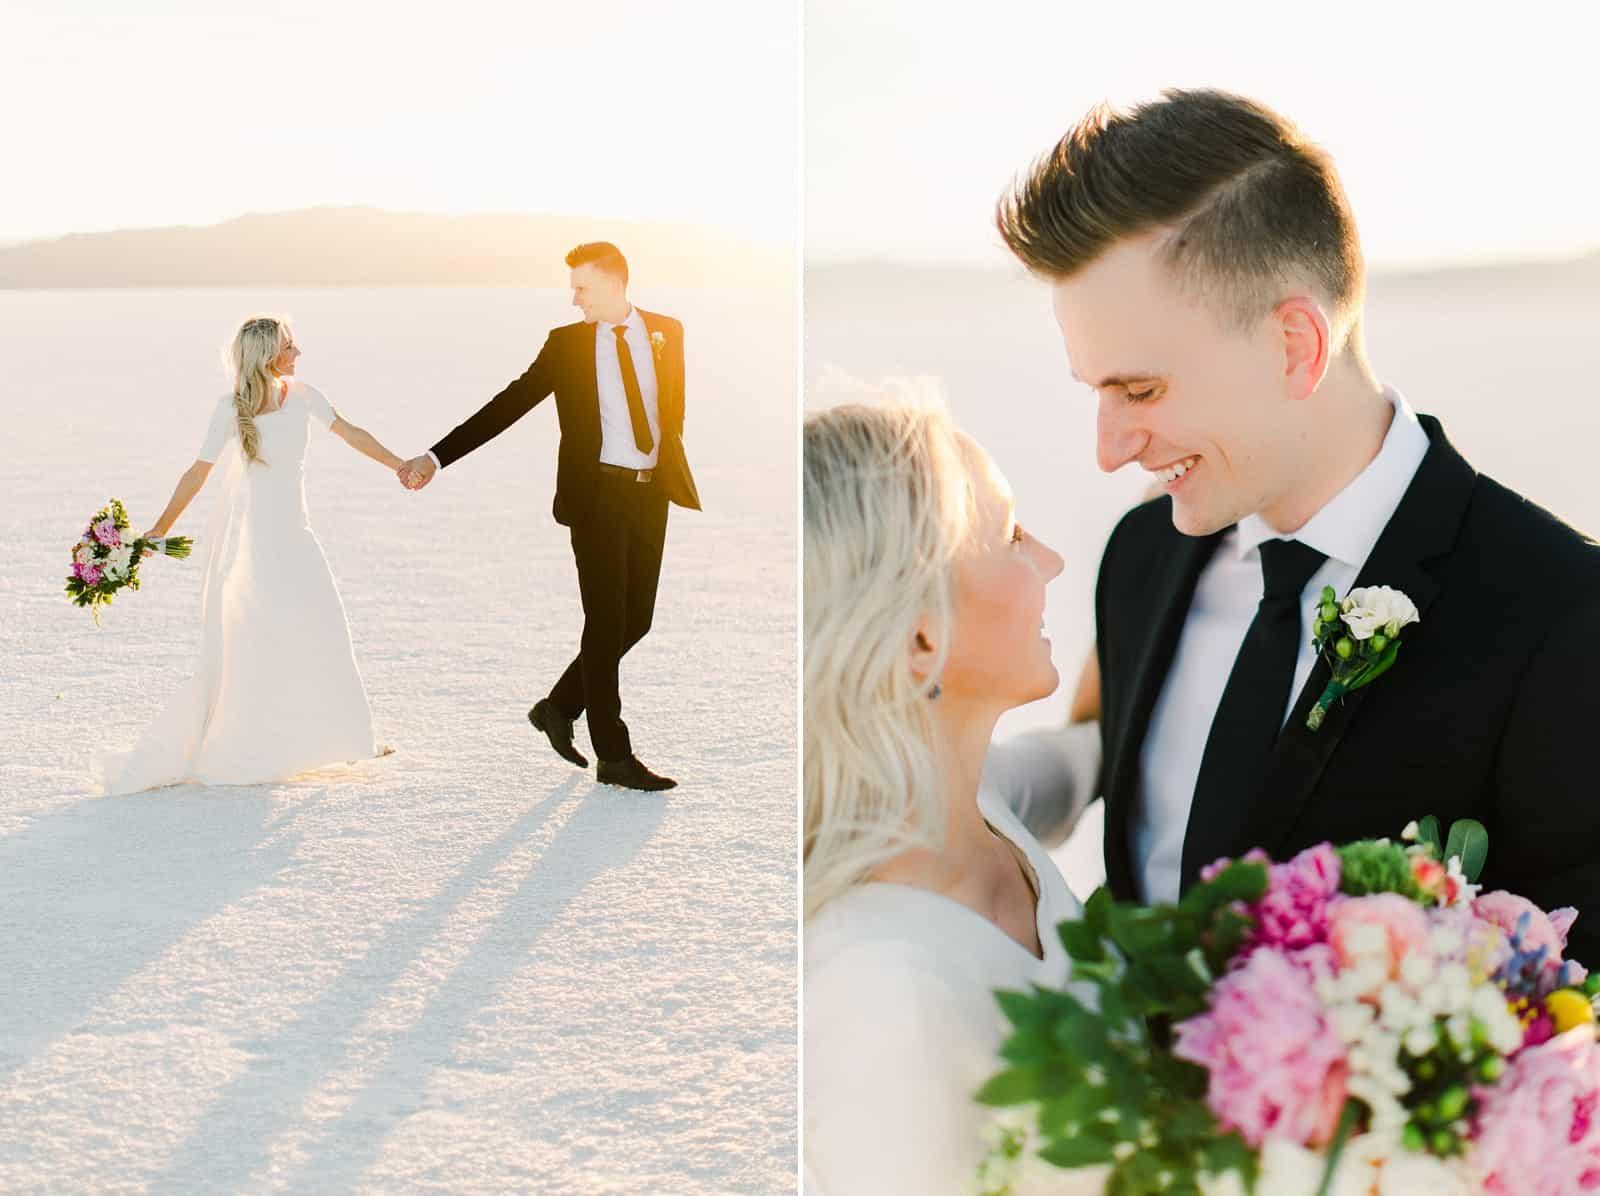 Bonneville Salt Flats Utah Wedding Photography, destination wedding, bride and groom golden sunset light